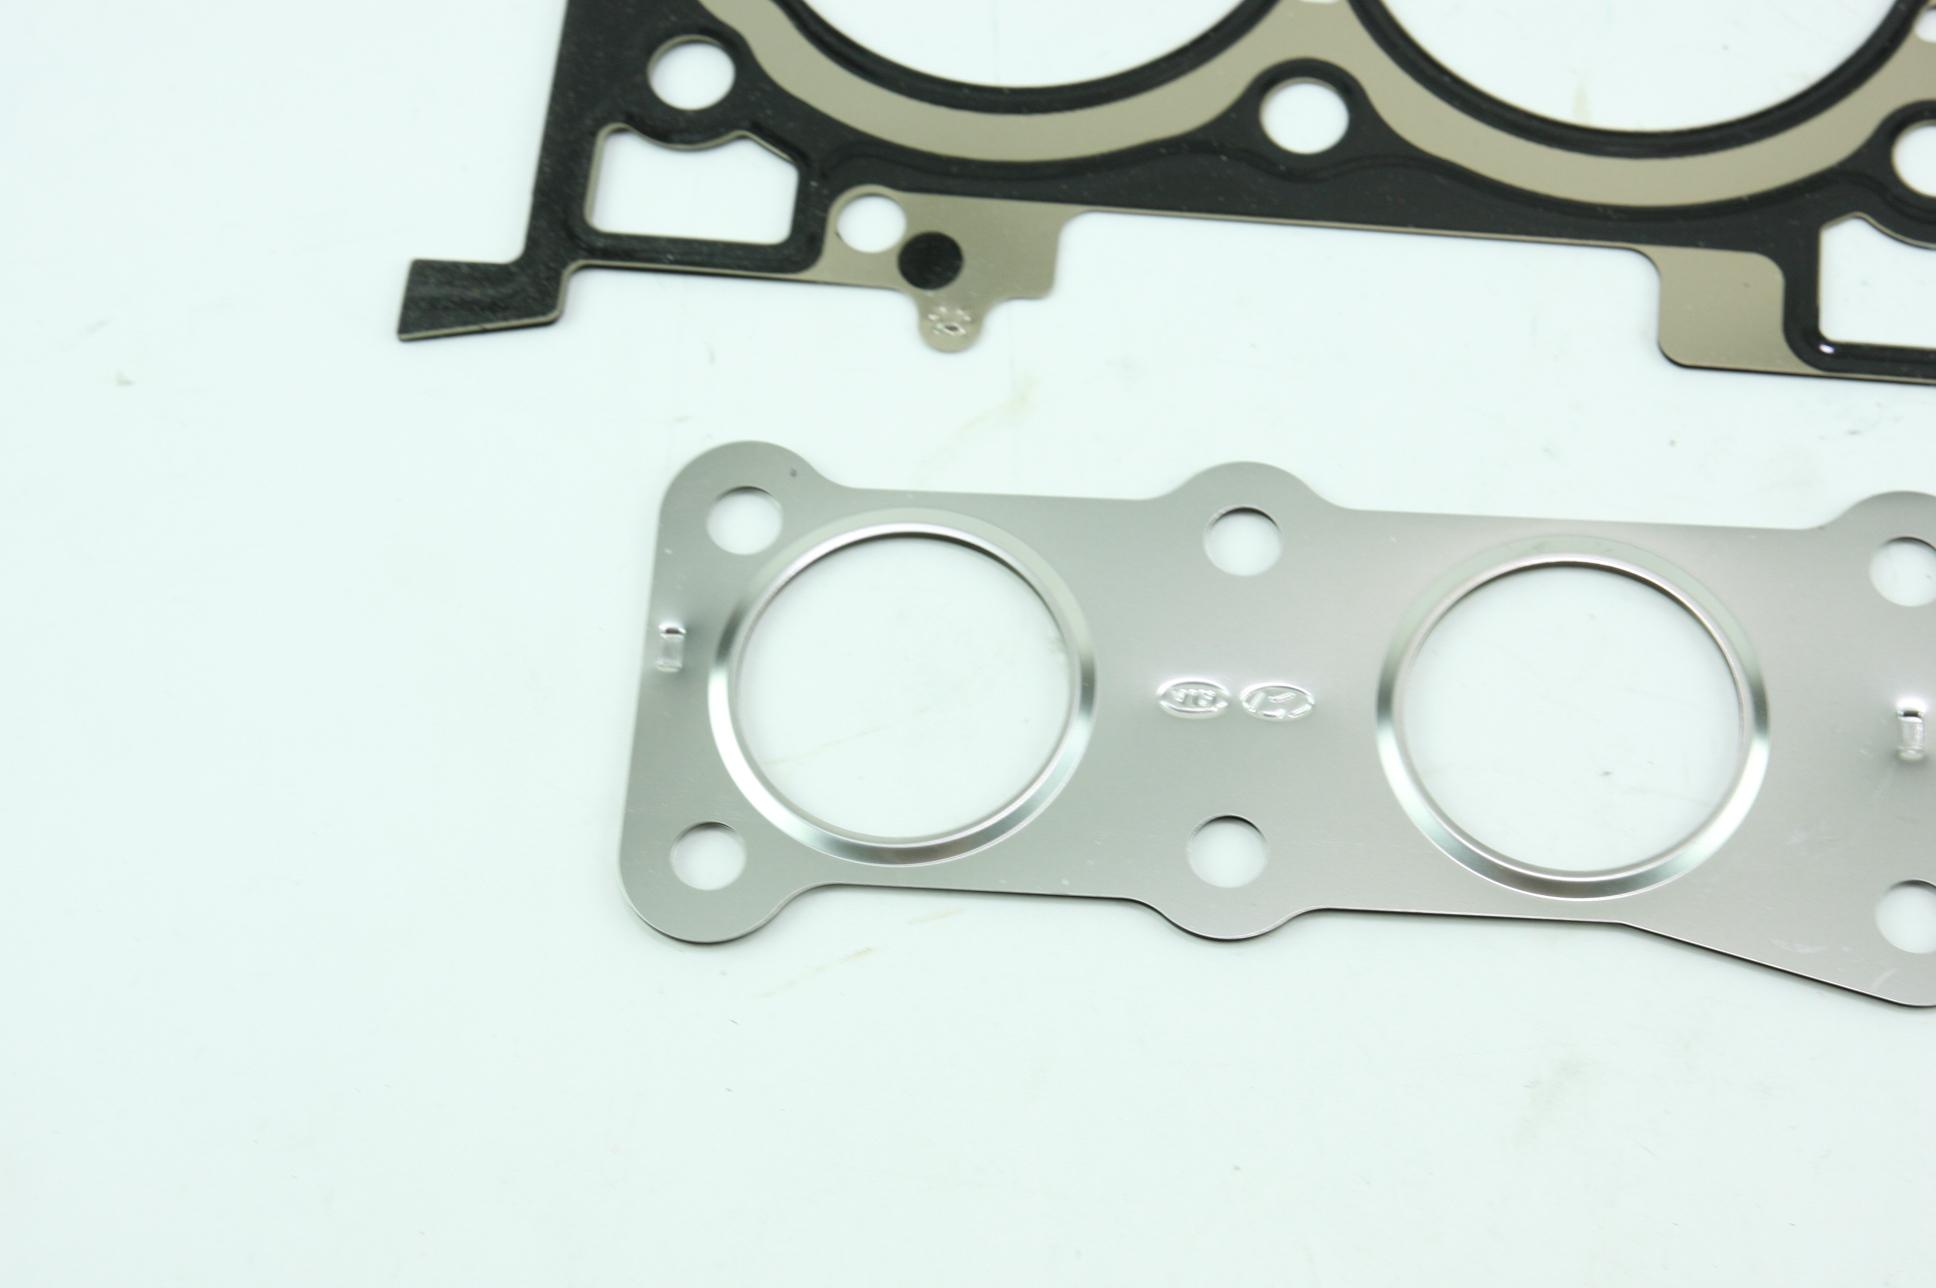 ** New Genuine Hyundai 209102GK03 Full Engine Overhaul Gasket Set Free Shipping - image 11